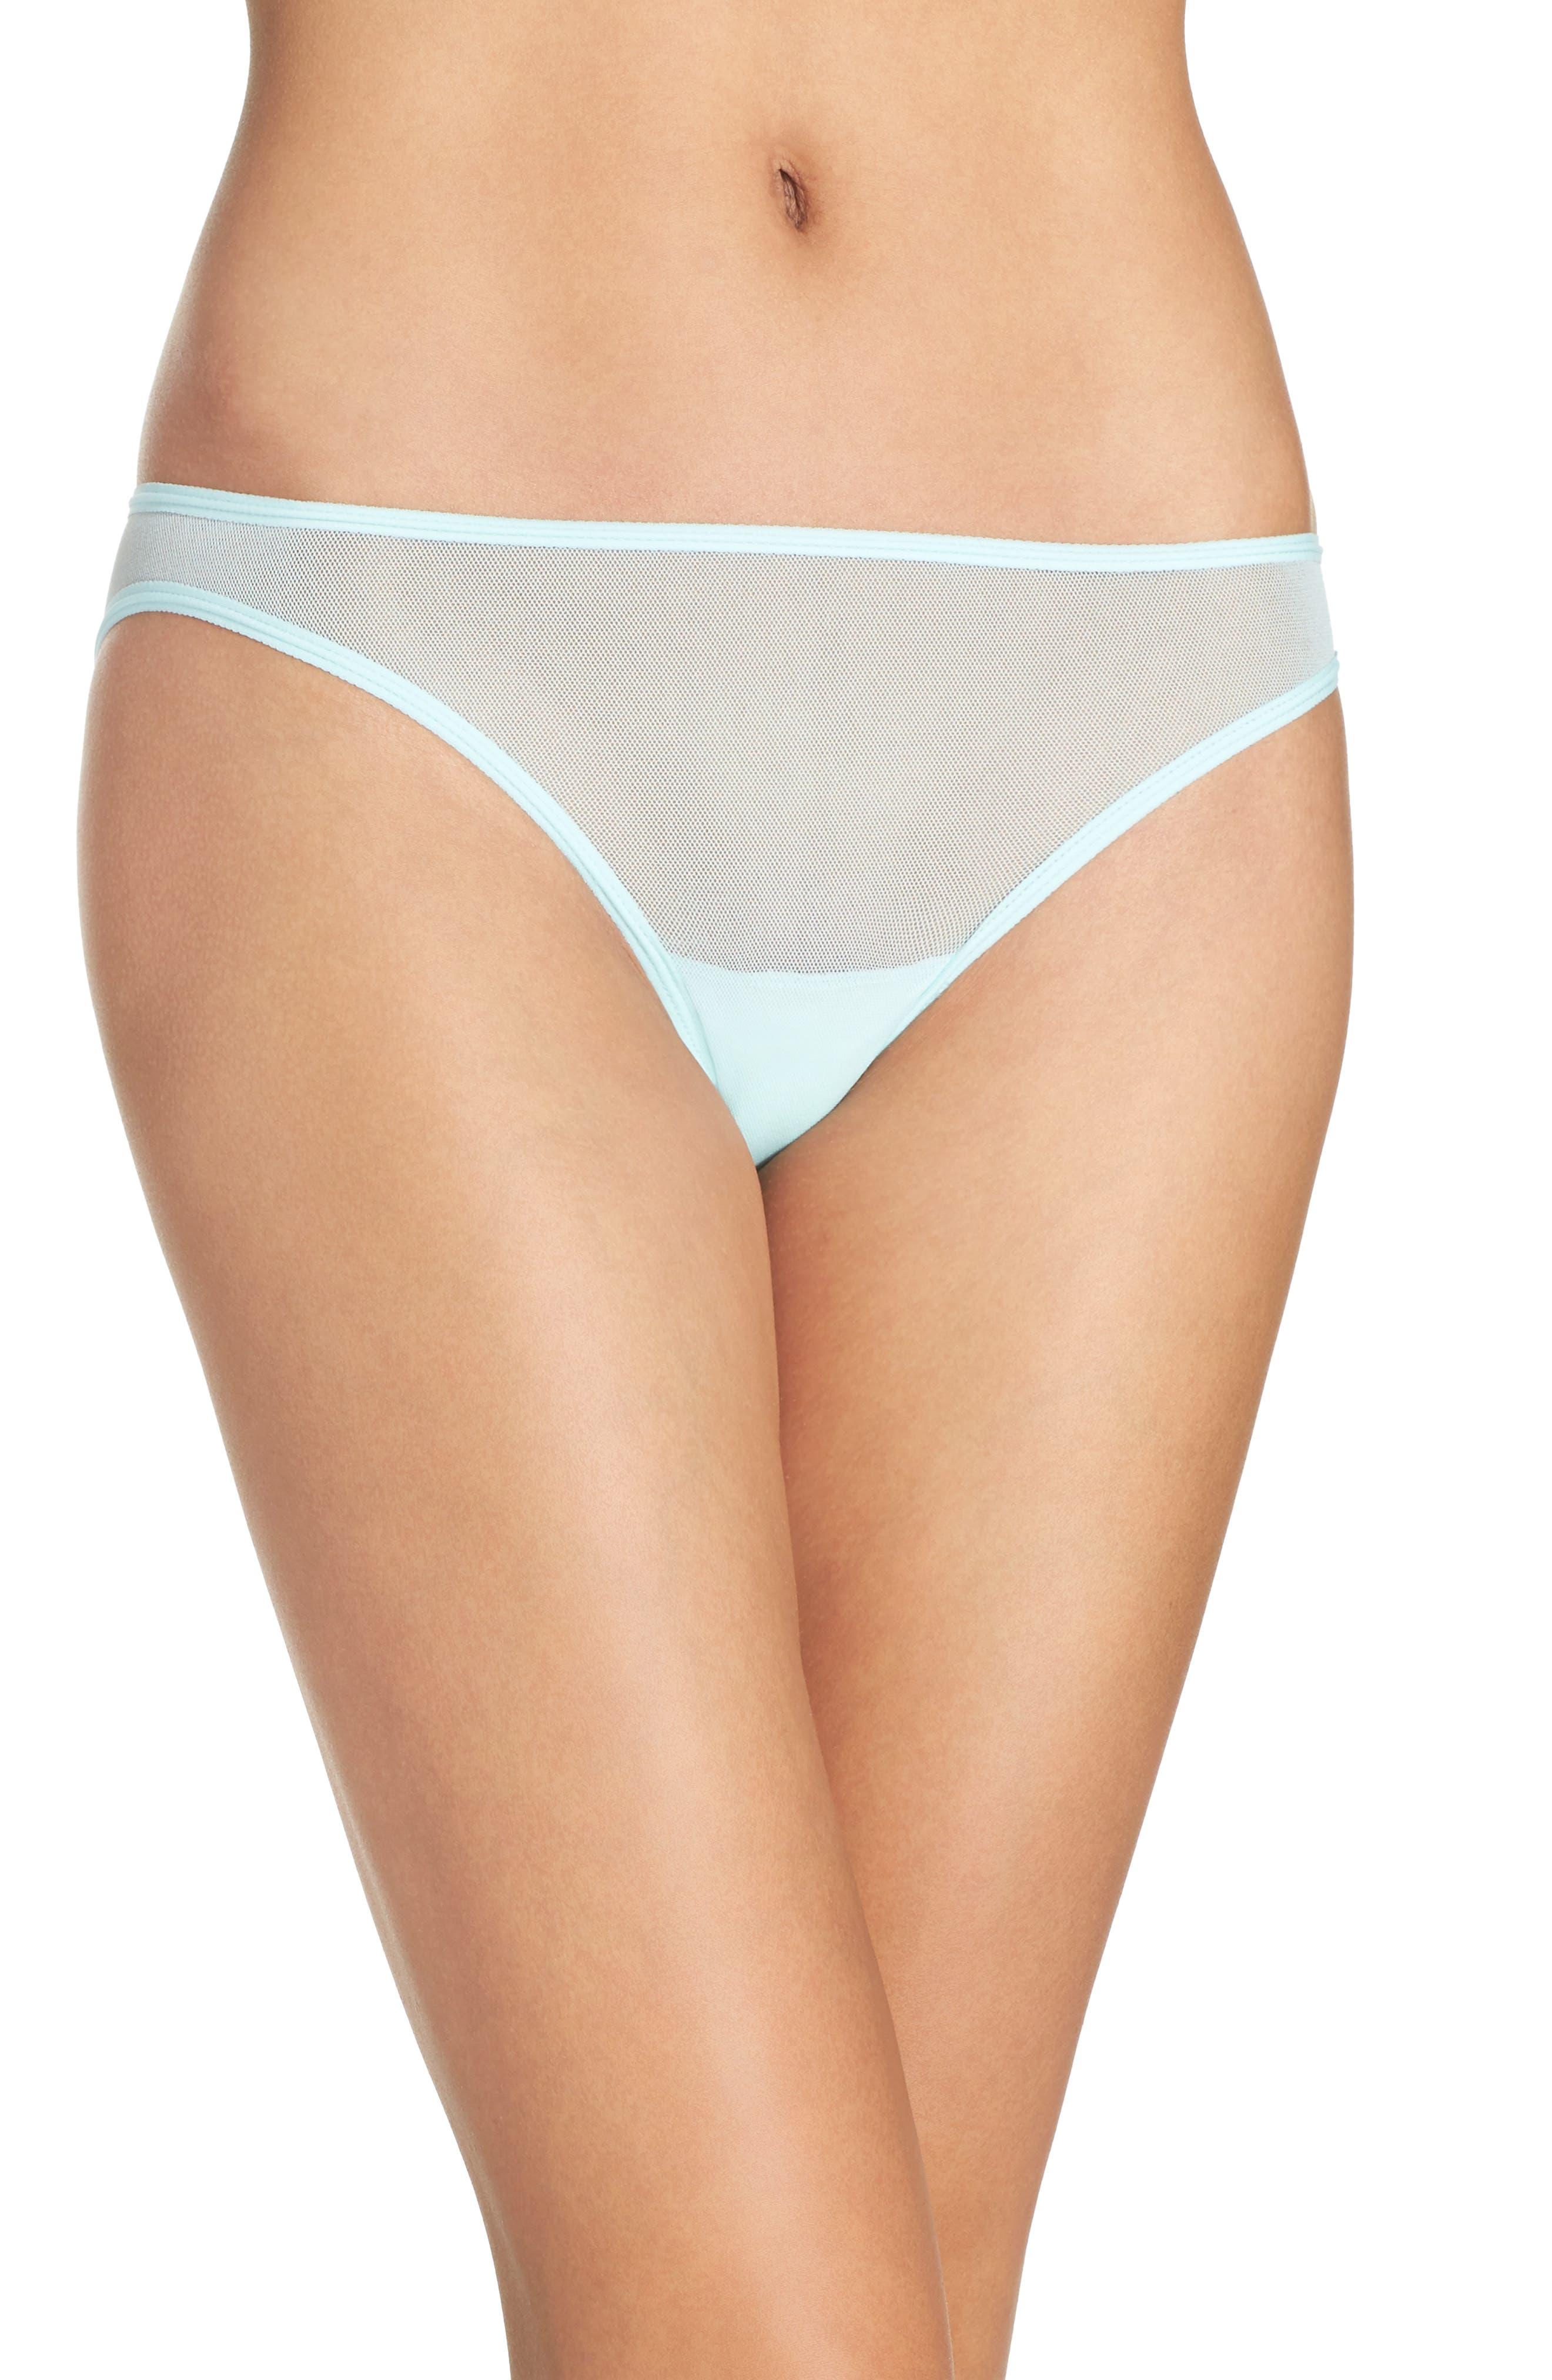 Alternate Image 1 Selected - Cosabella 'Soire' Low Rise Bikini